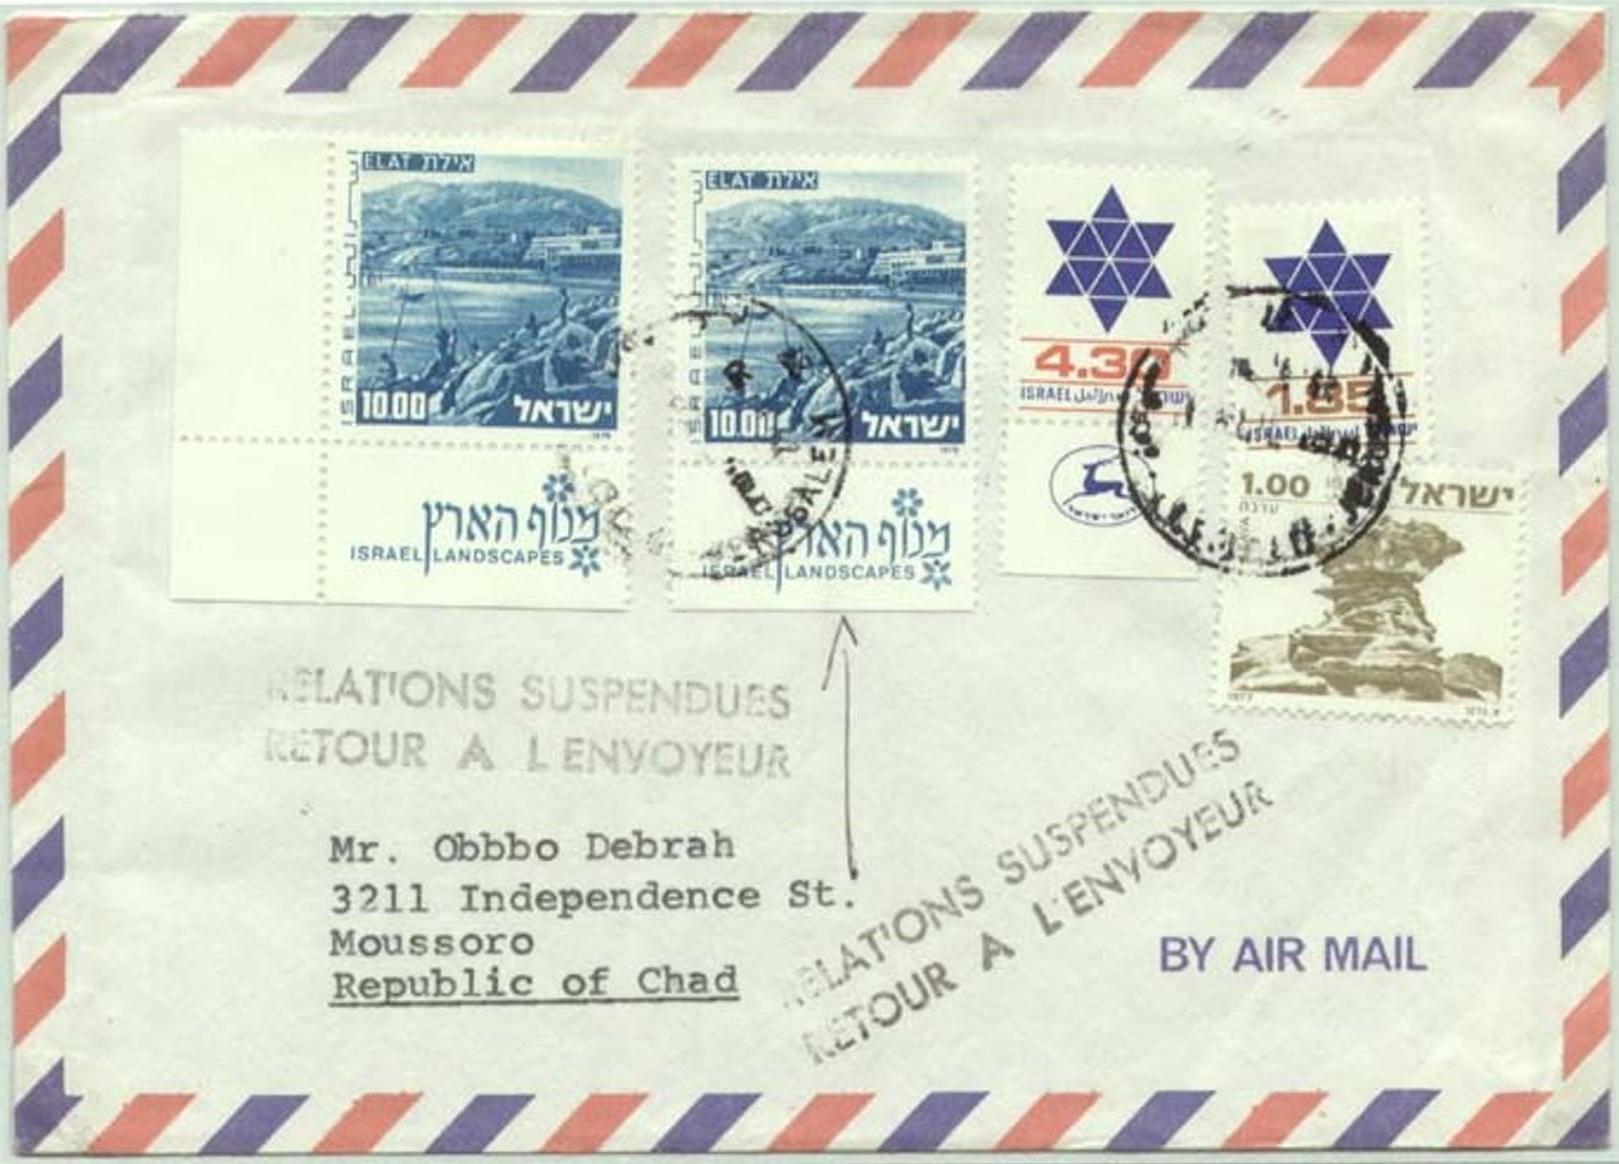 Chadian postal boycott of Israel: 29-8-1980 a/m comm cv ex J'LEM to MOUSSORO Chad, franked 27.15L during new